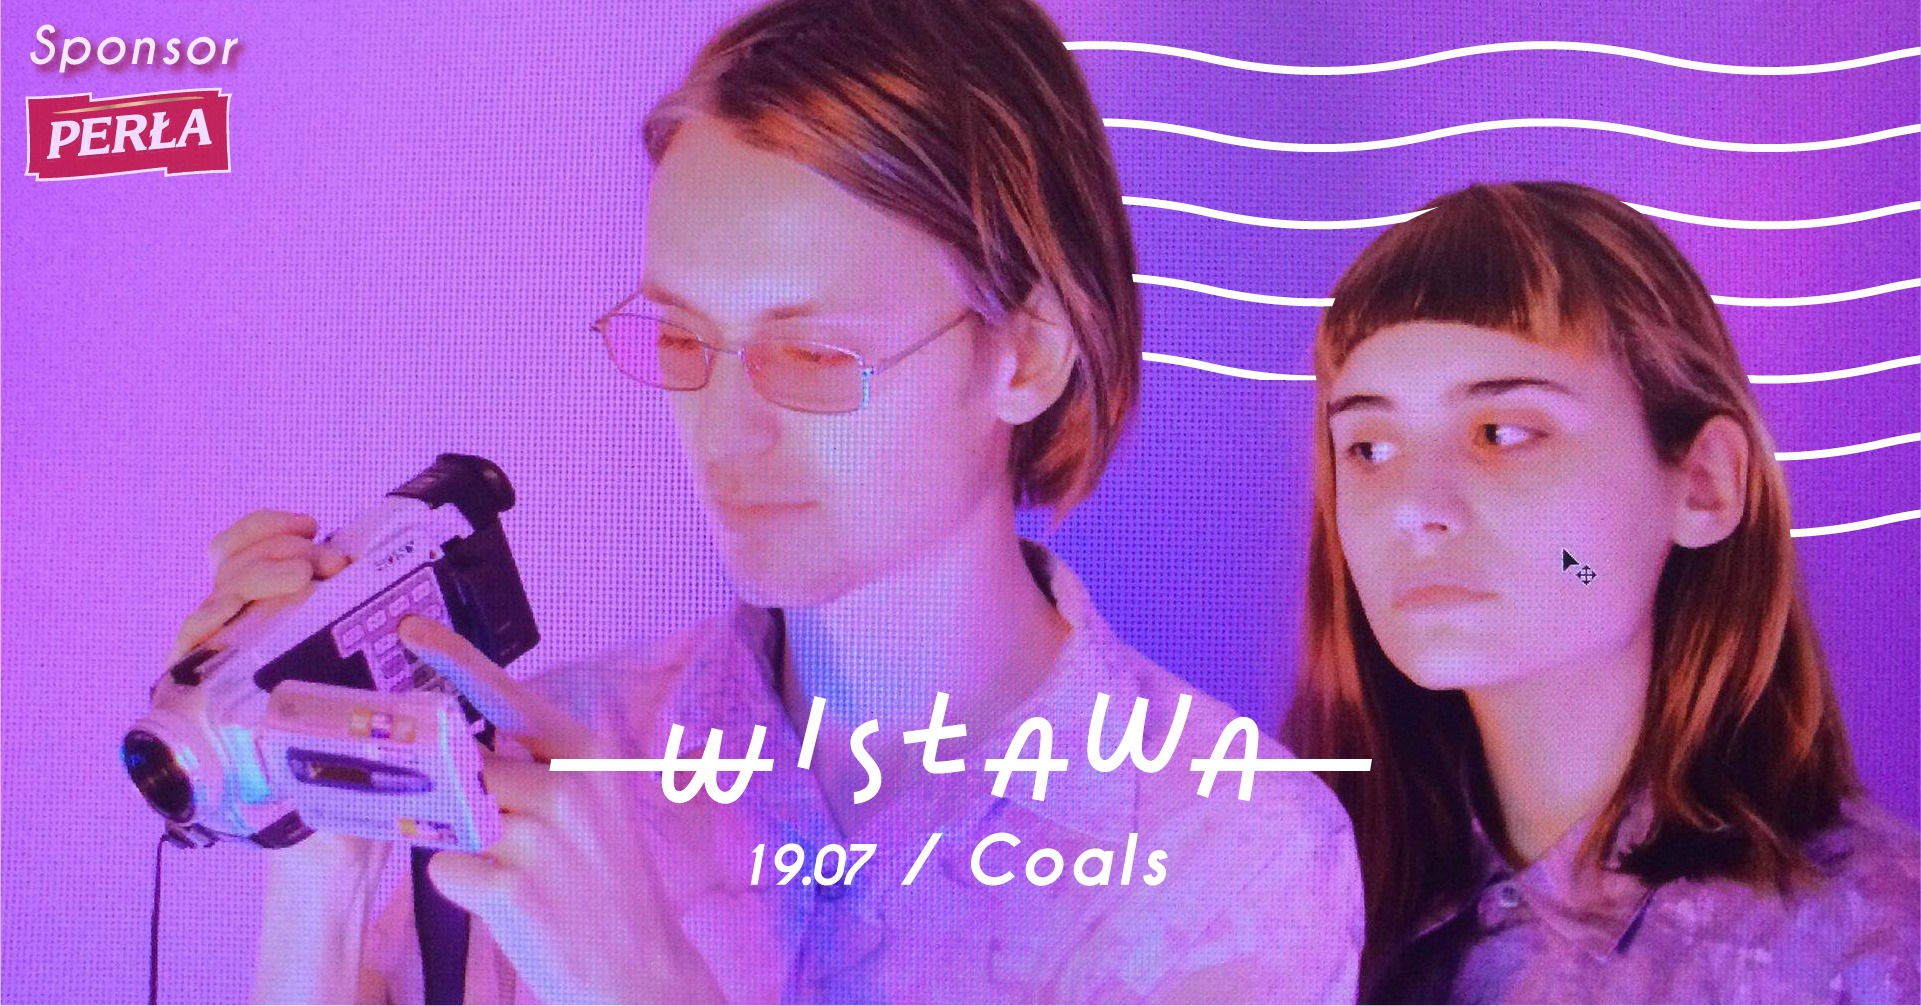 Coals Wisława x 19.07